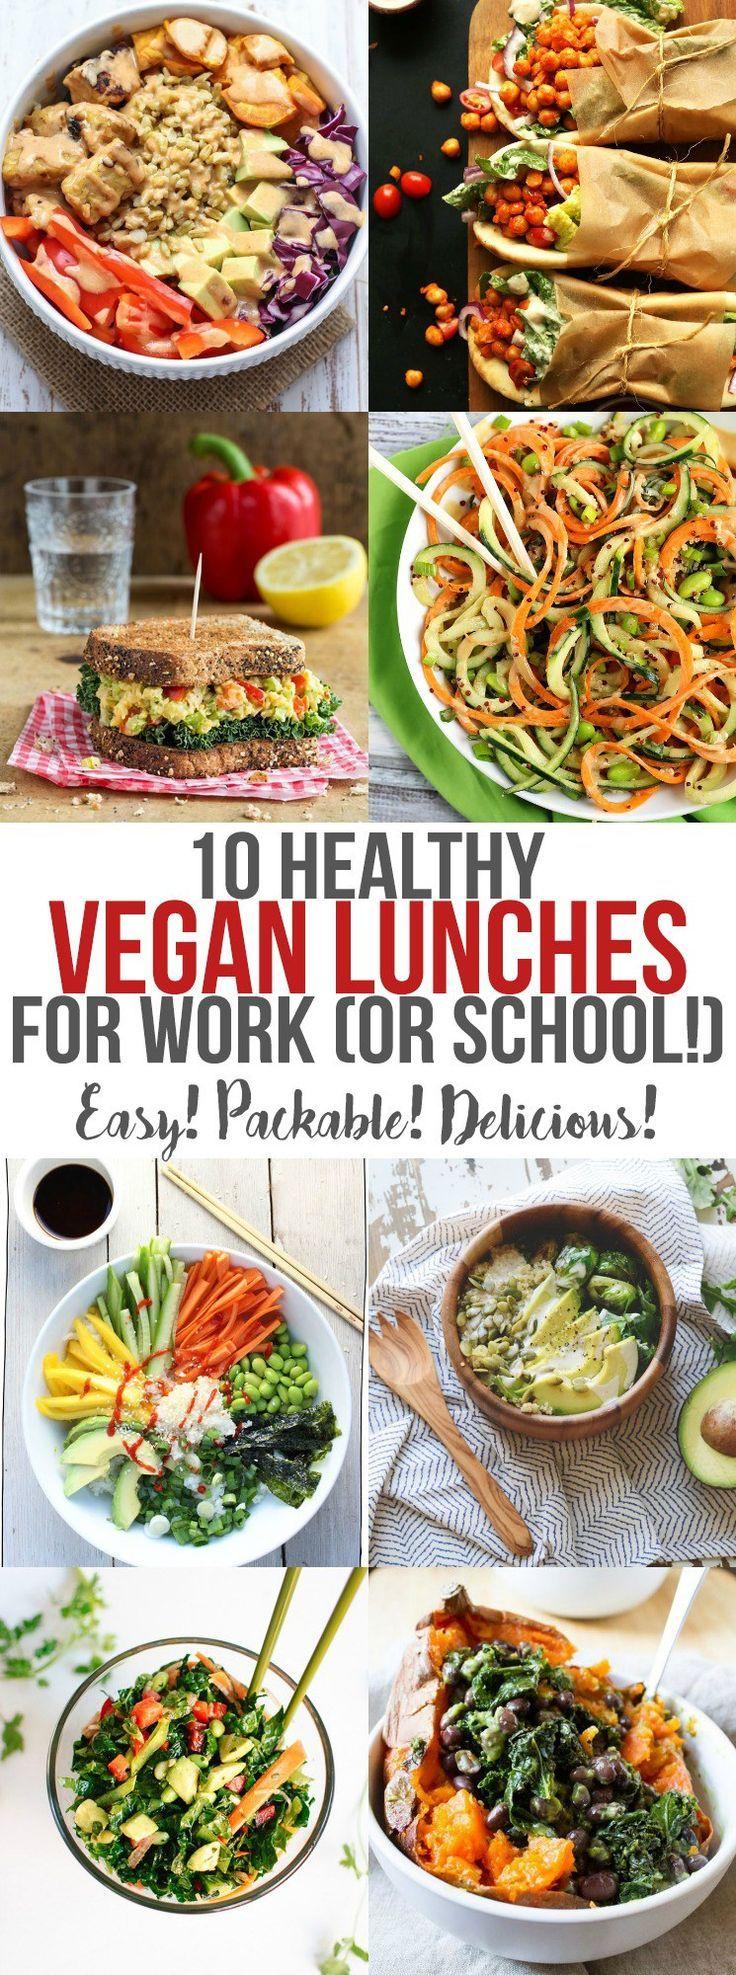 10 Healthy Vegan Lunches For Work Or School Vegan